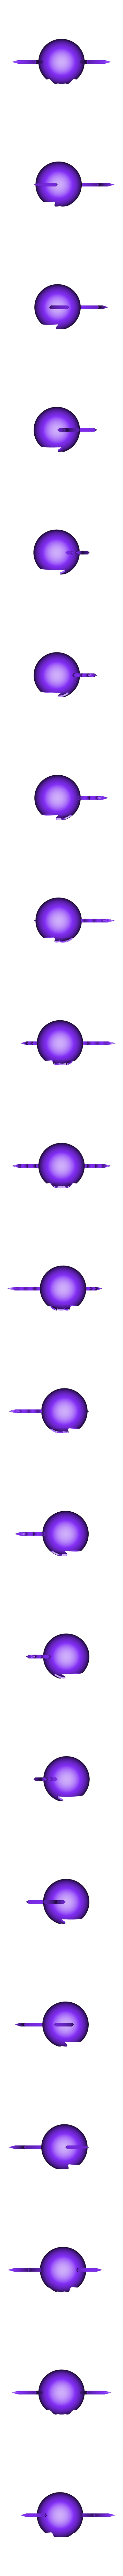 bat_ball_whole_no_ring.stl Download free STL file BatBall & GhostGlobe • 3D printer design, tone001